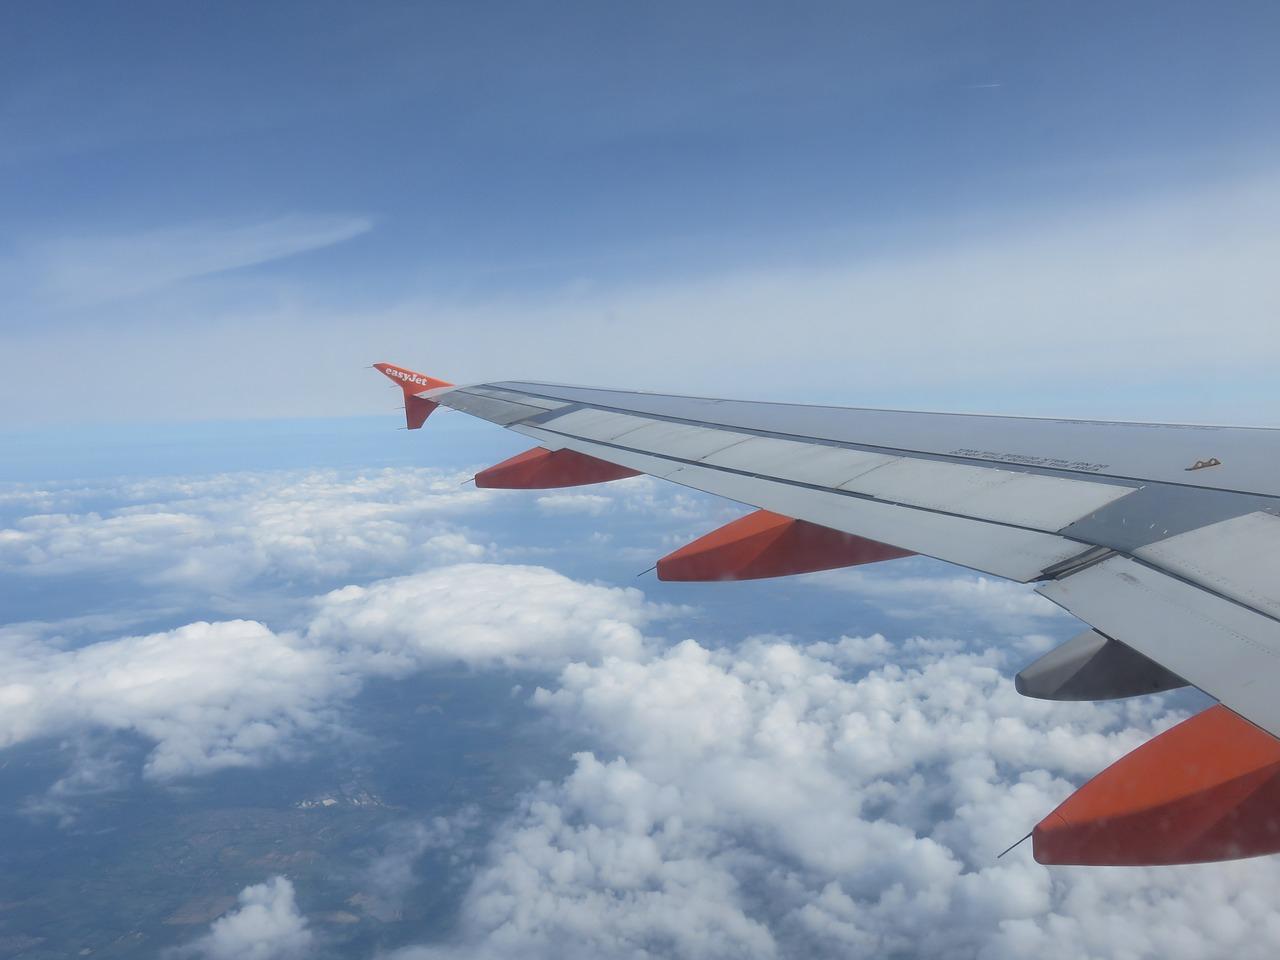 Faro Airport Information